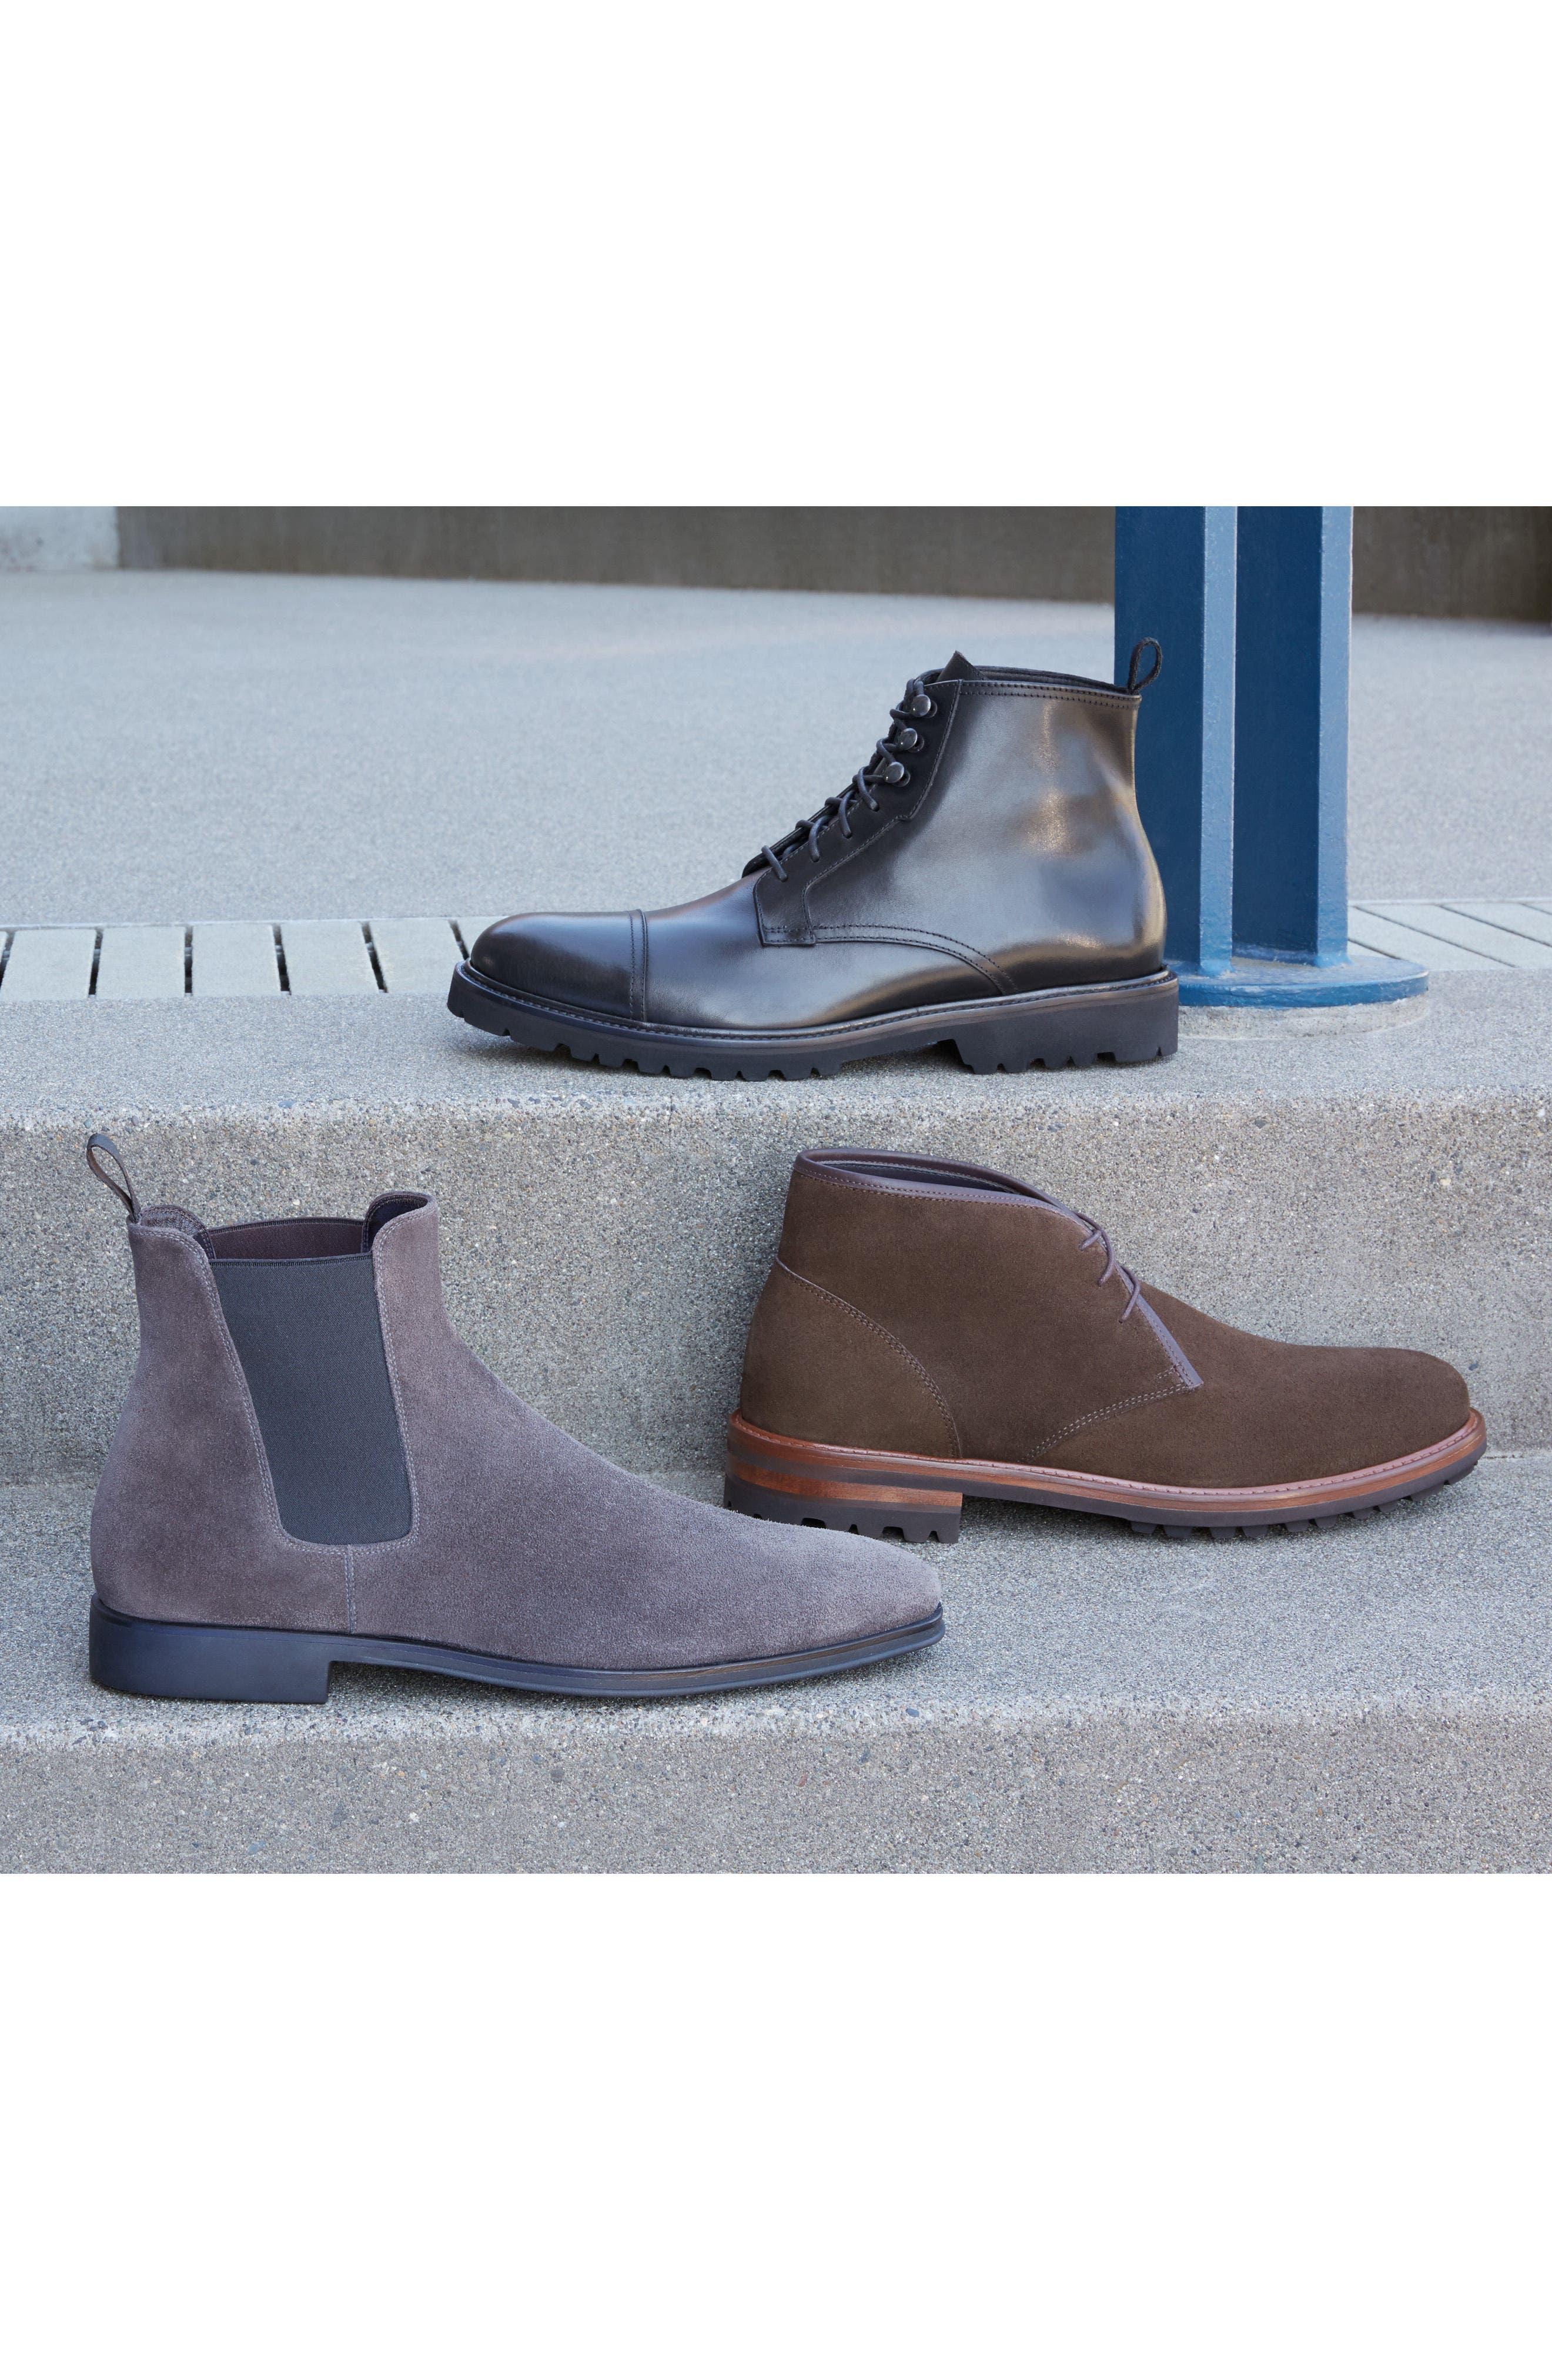 Brixen Waterproof Chukka Boot,                             Alternate thumbnail 8, color,